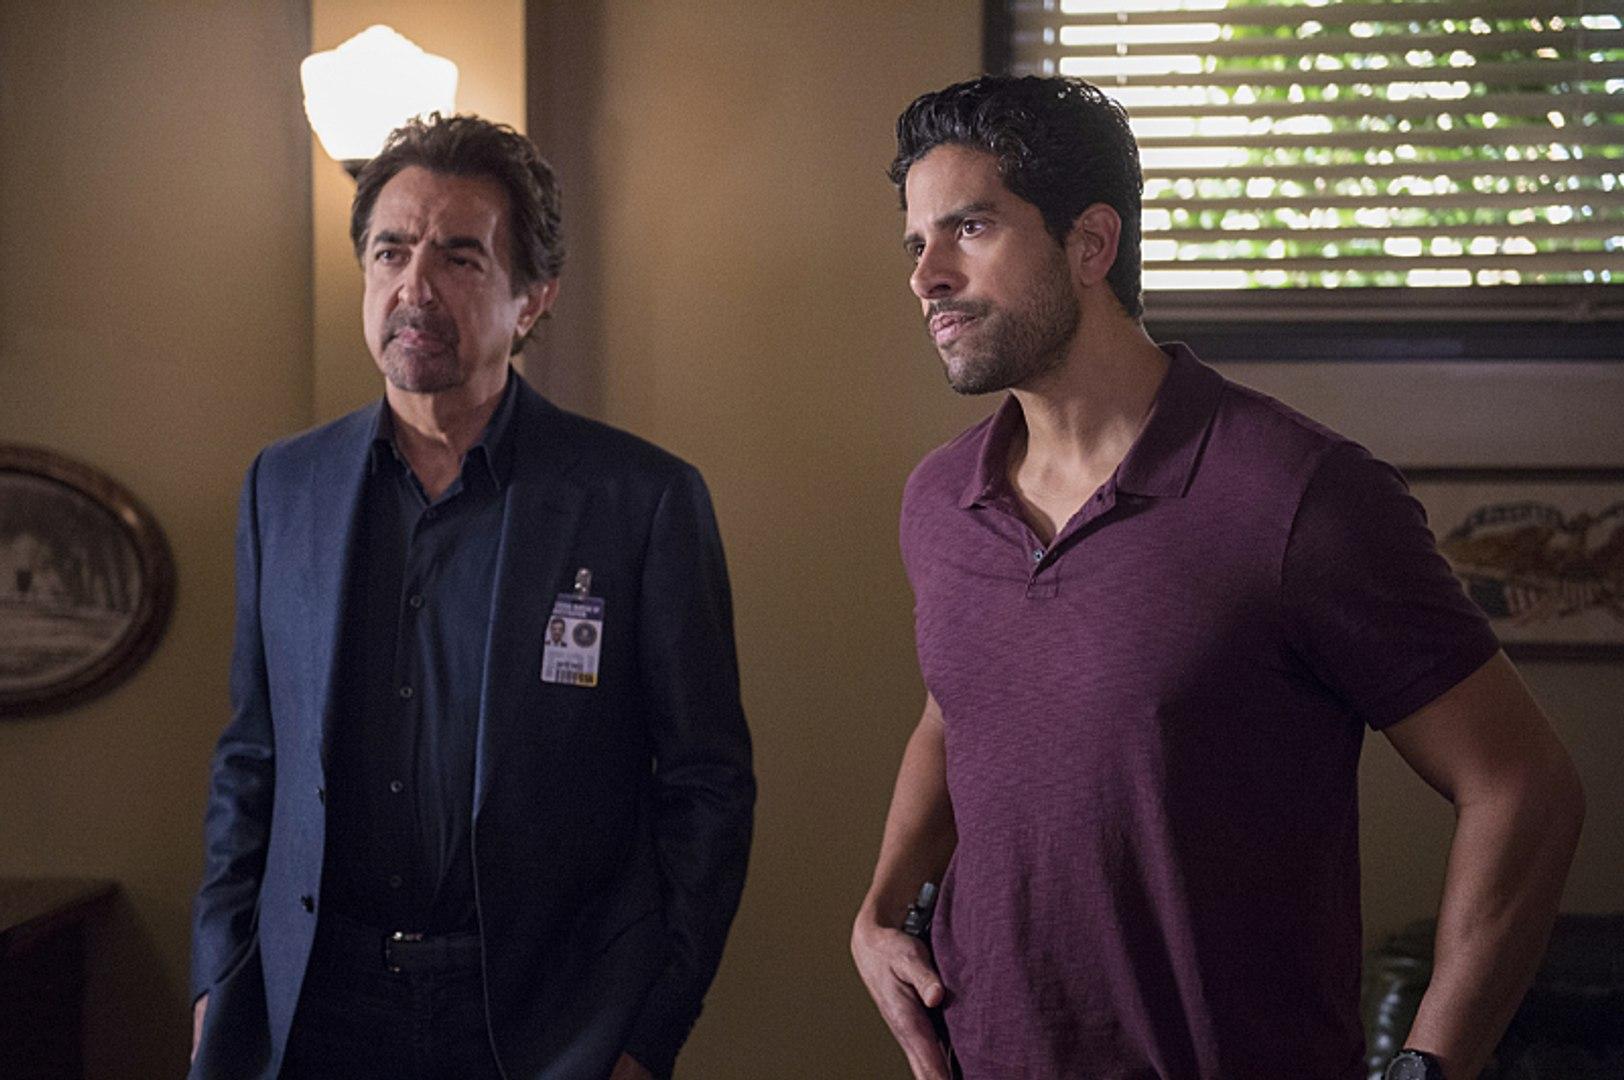 criminal minds season 13 episode 14 watch online free